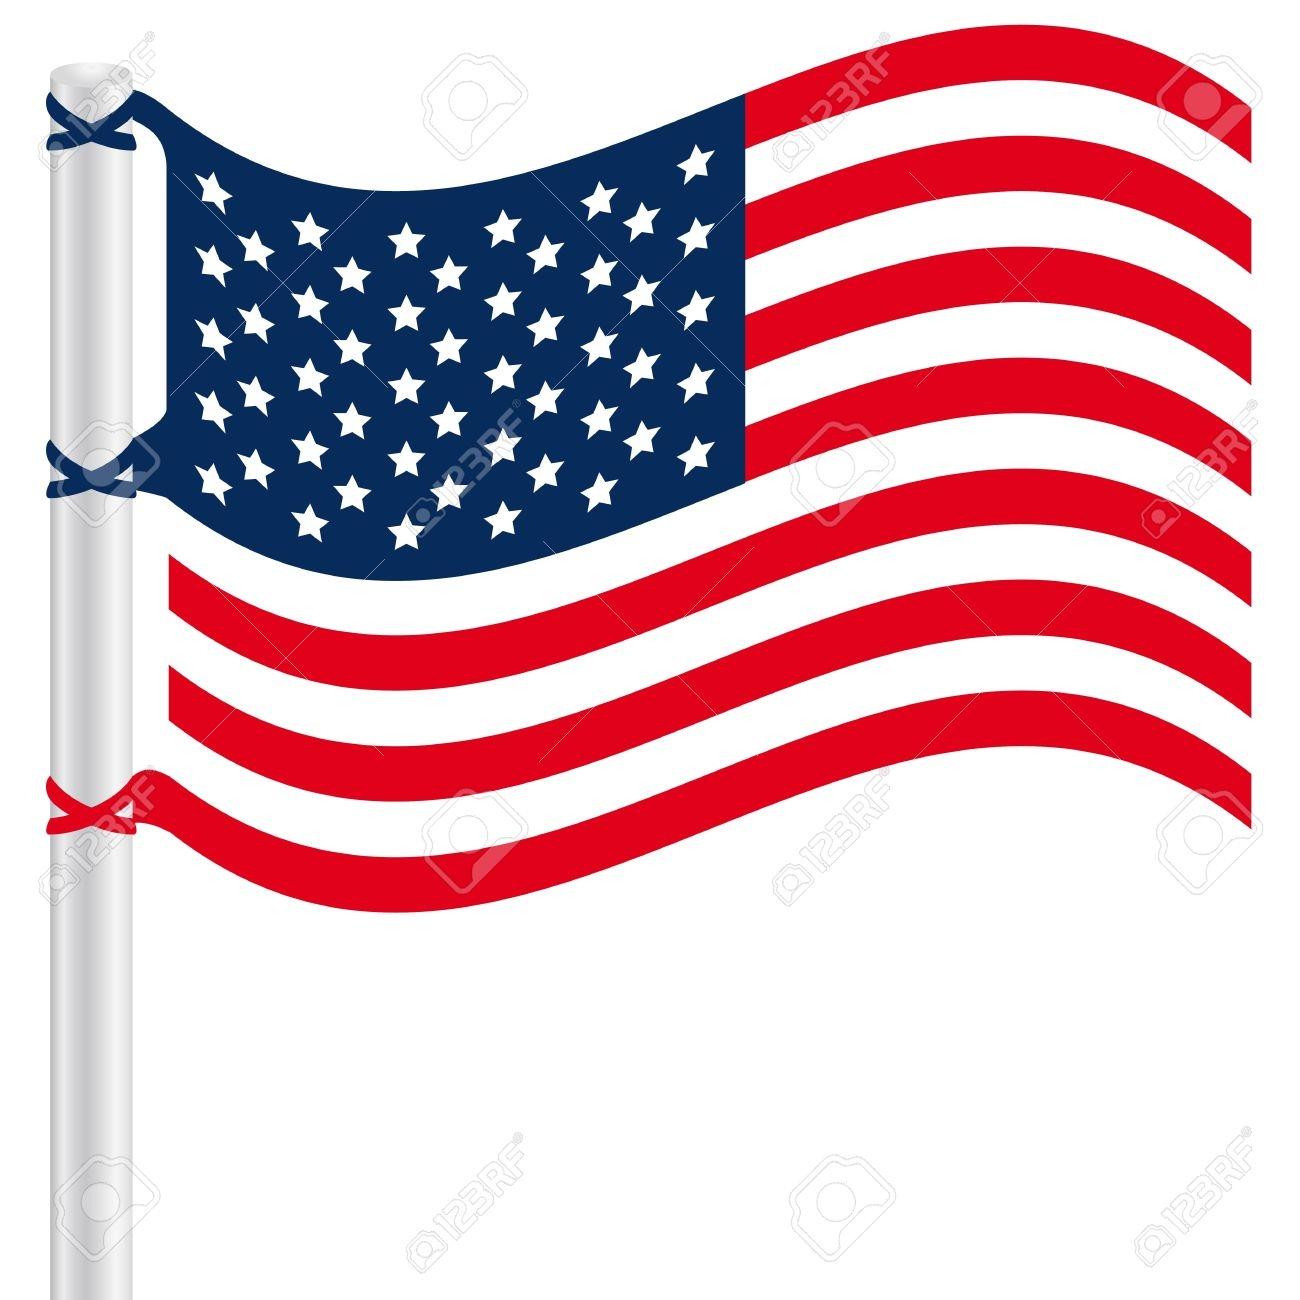 American Flag Clipart-American flag clipart-3